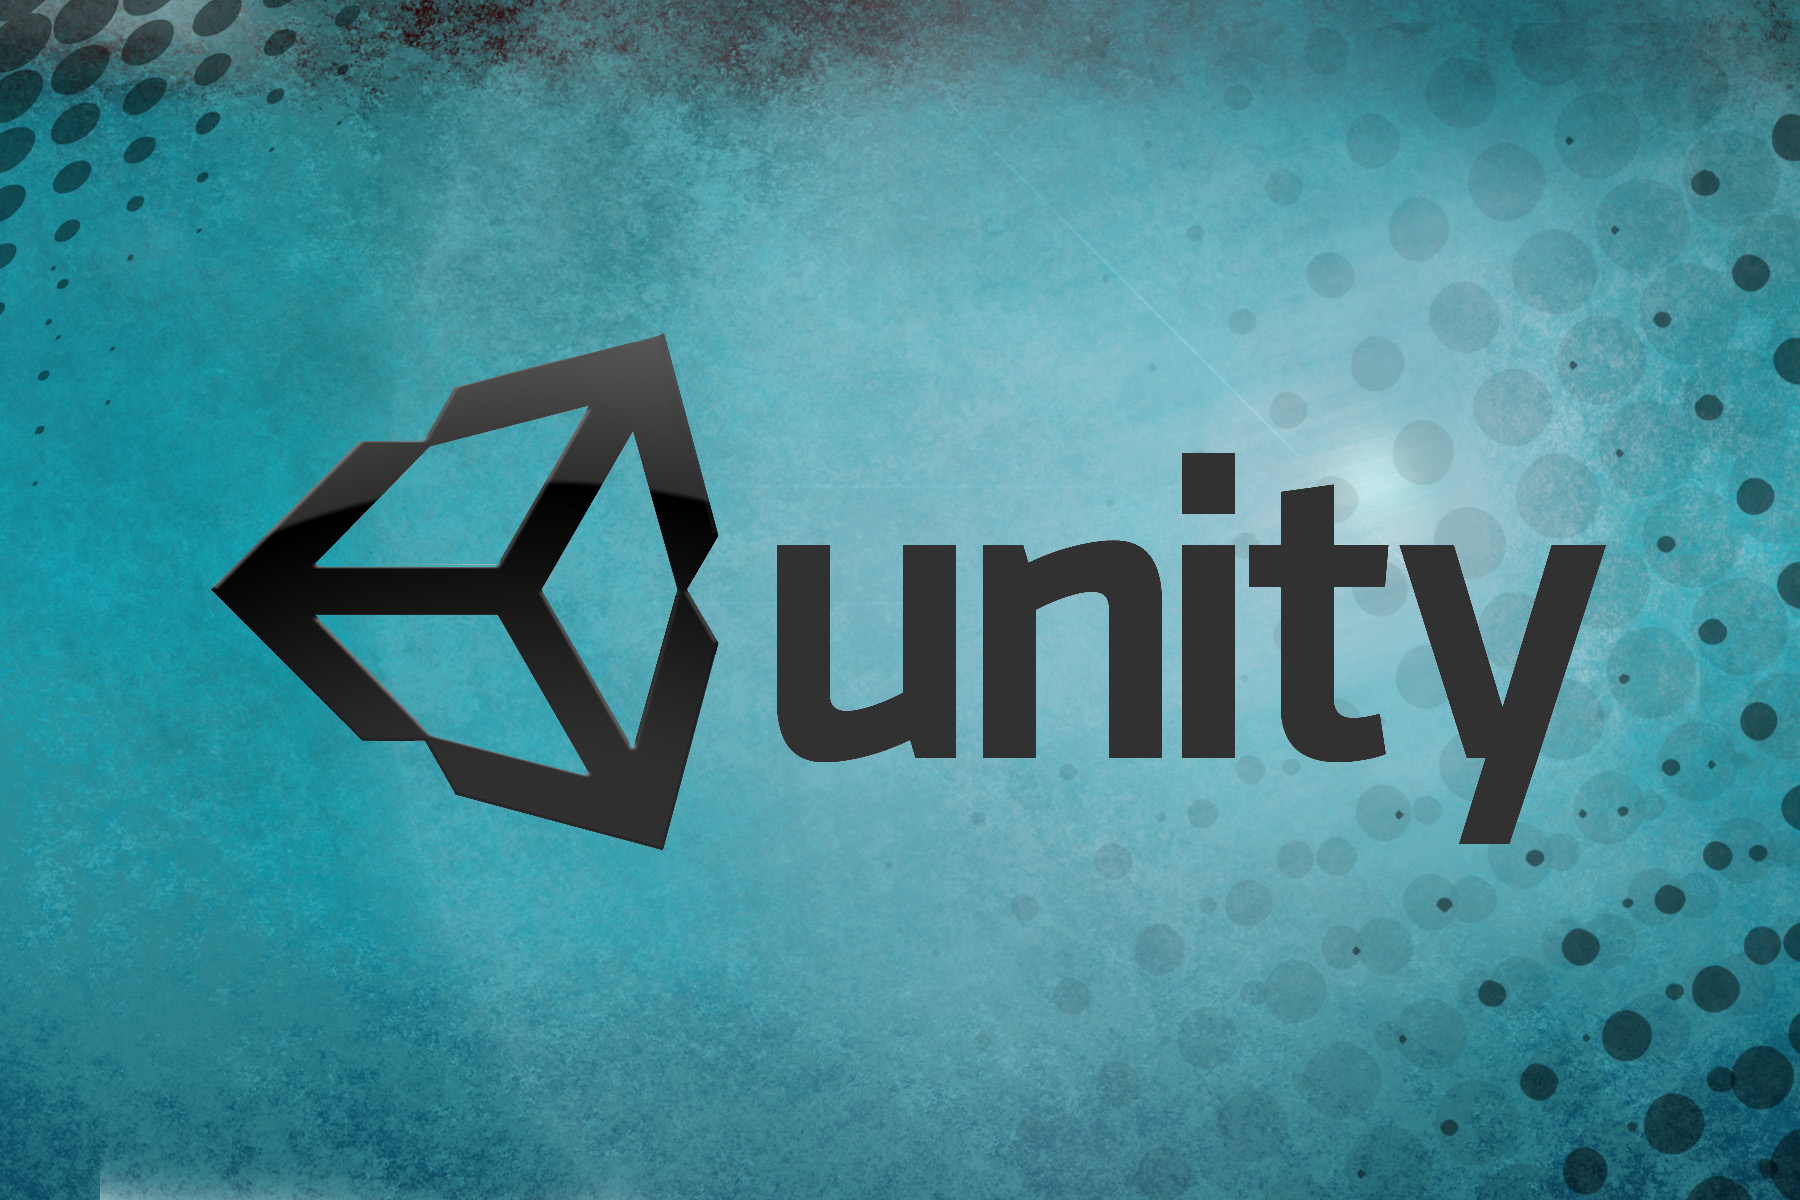 Unity Desktop Backgrounds - Unity Forum